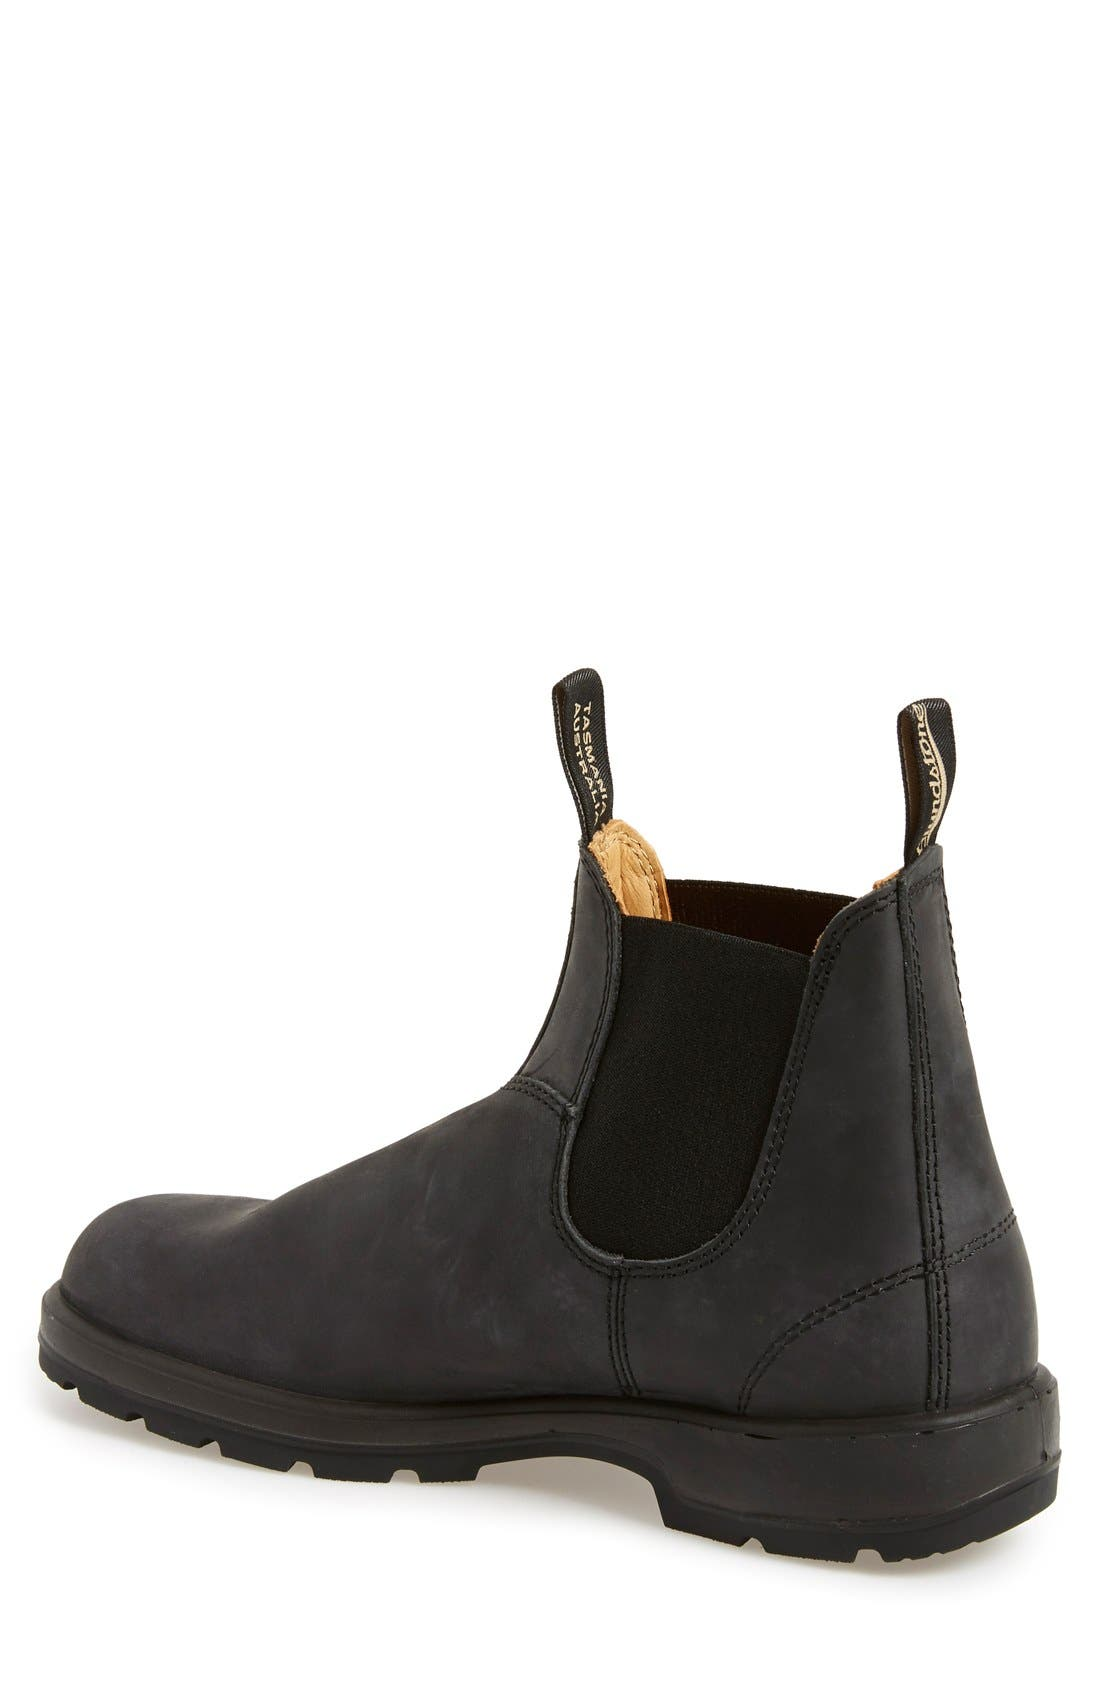 Footwear Chelsea Boot,                             Alternate thumbnail 5, color,                             RUSTIC BLACK